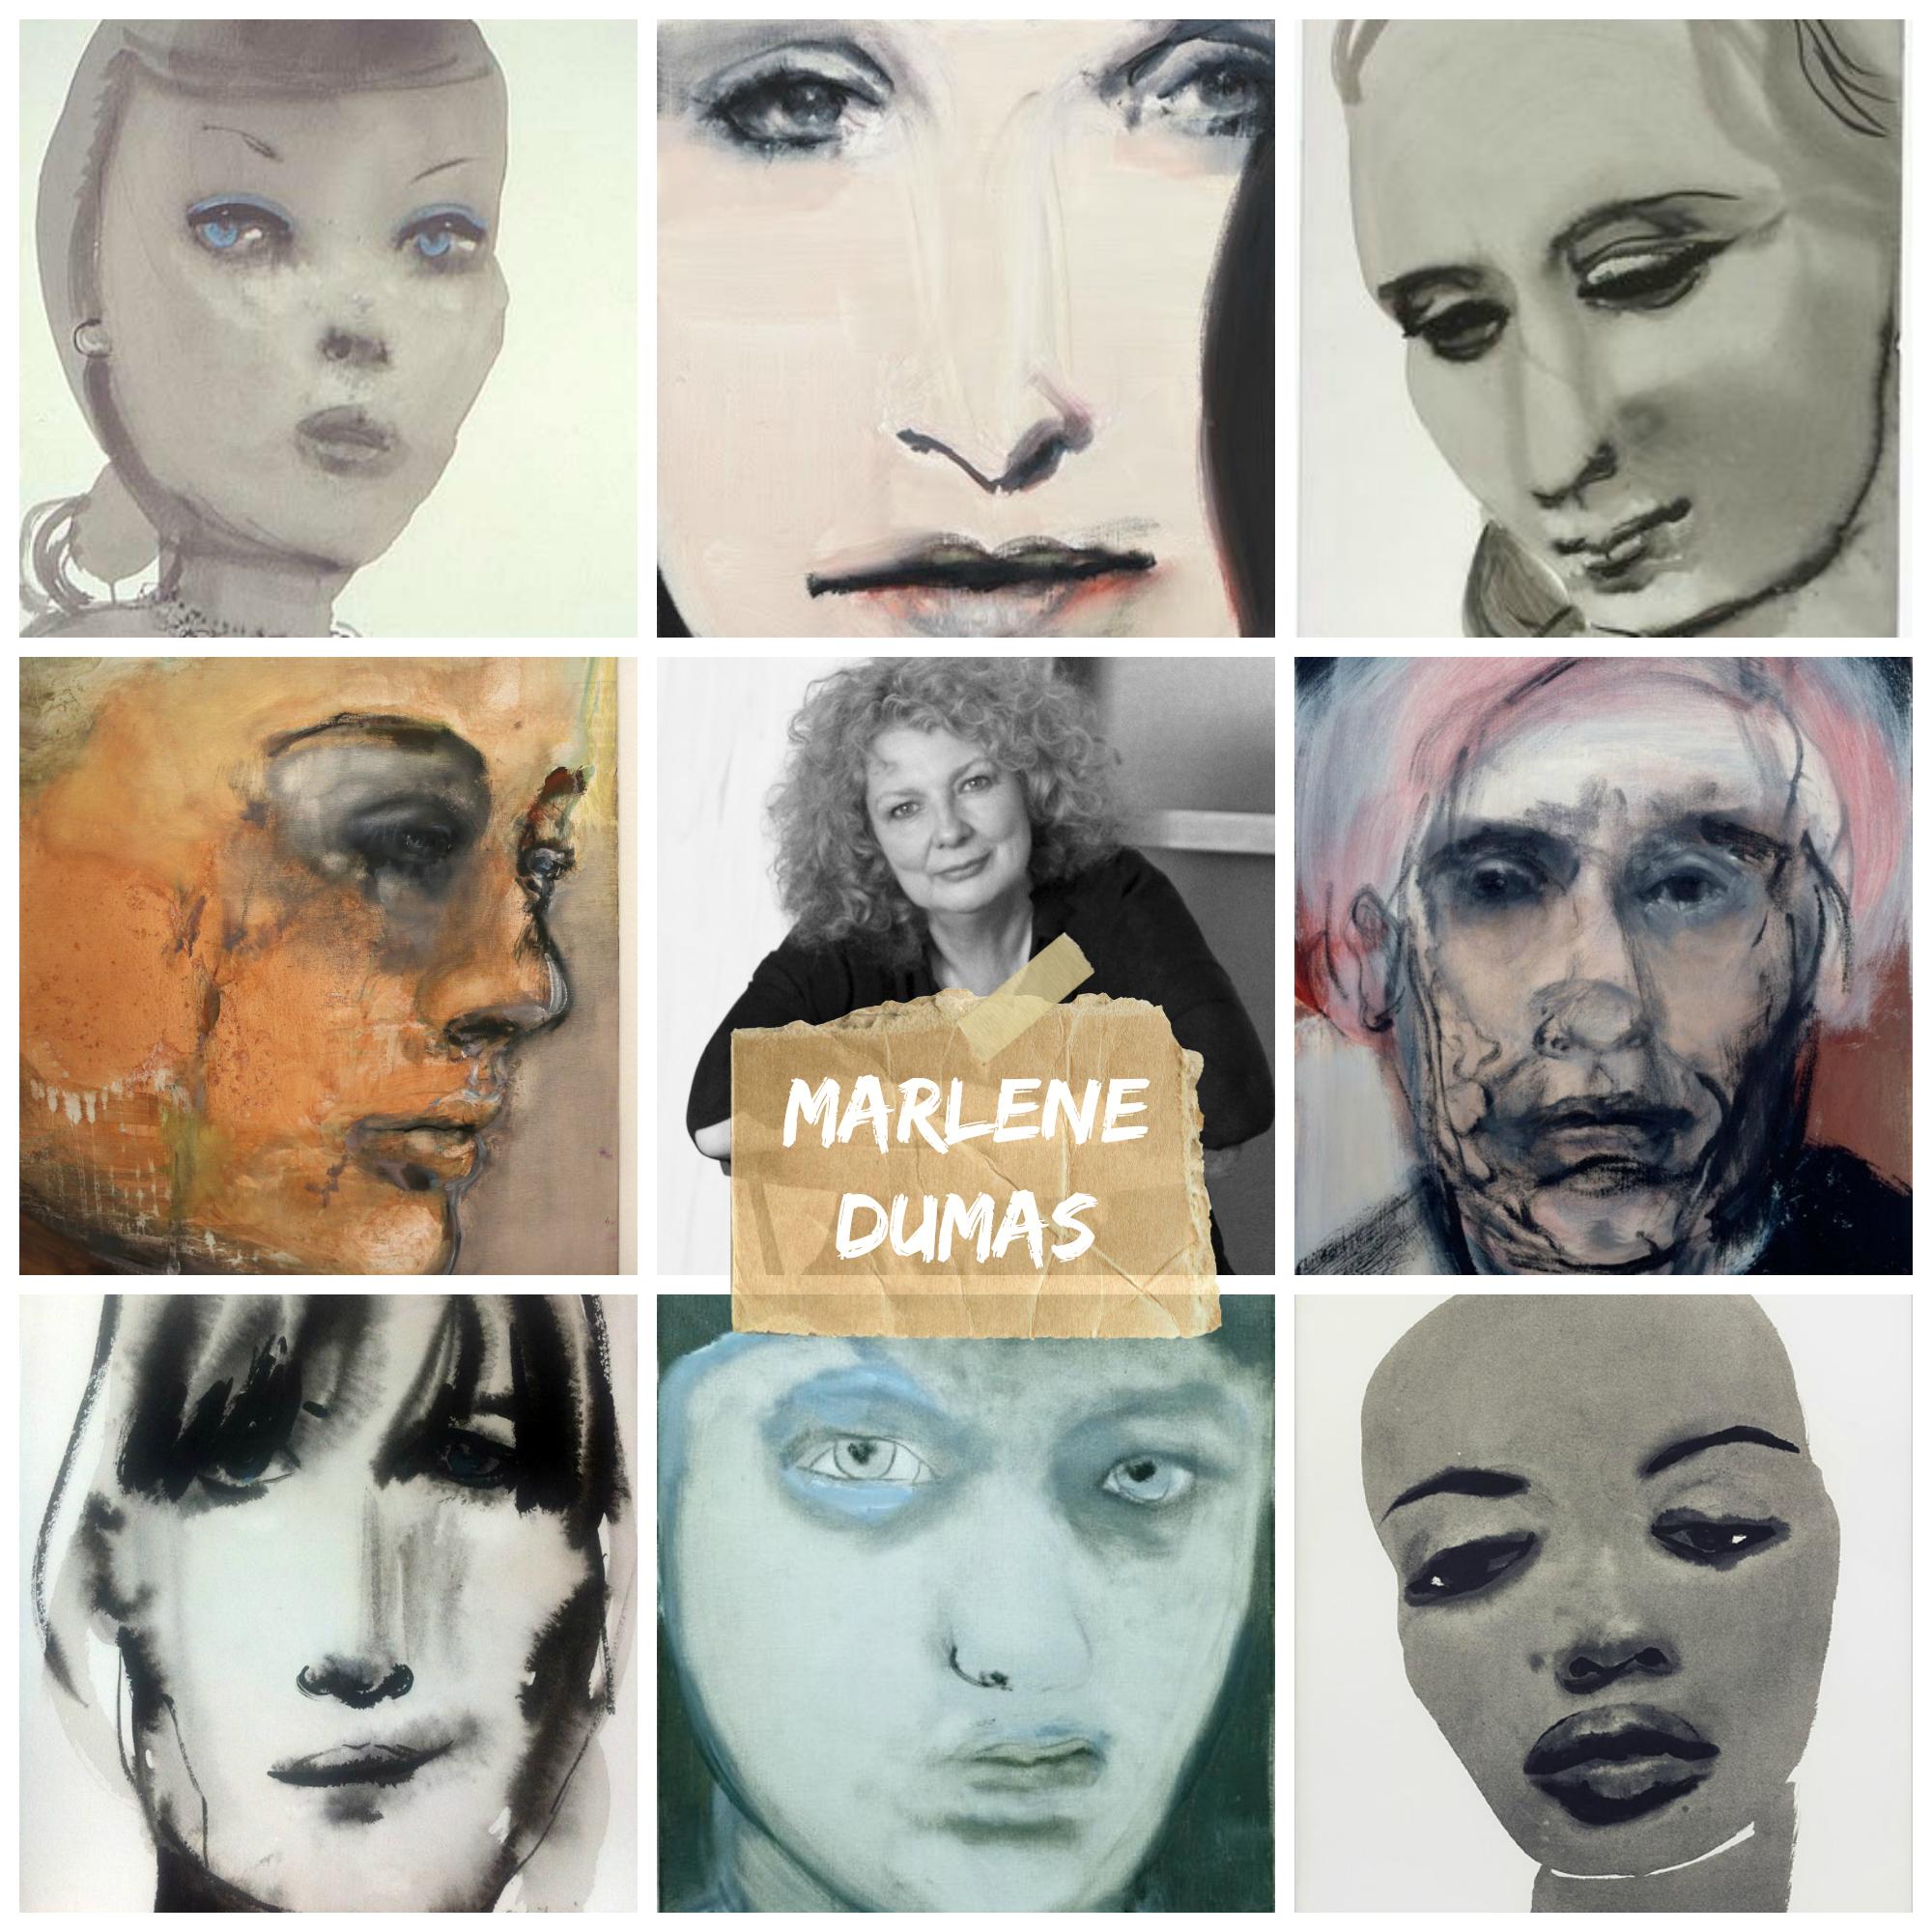 Marlene Dumas collage with type.jpg